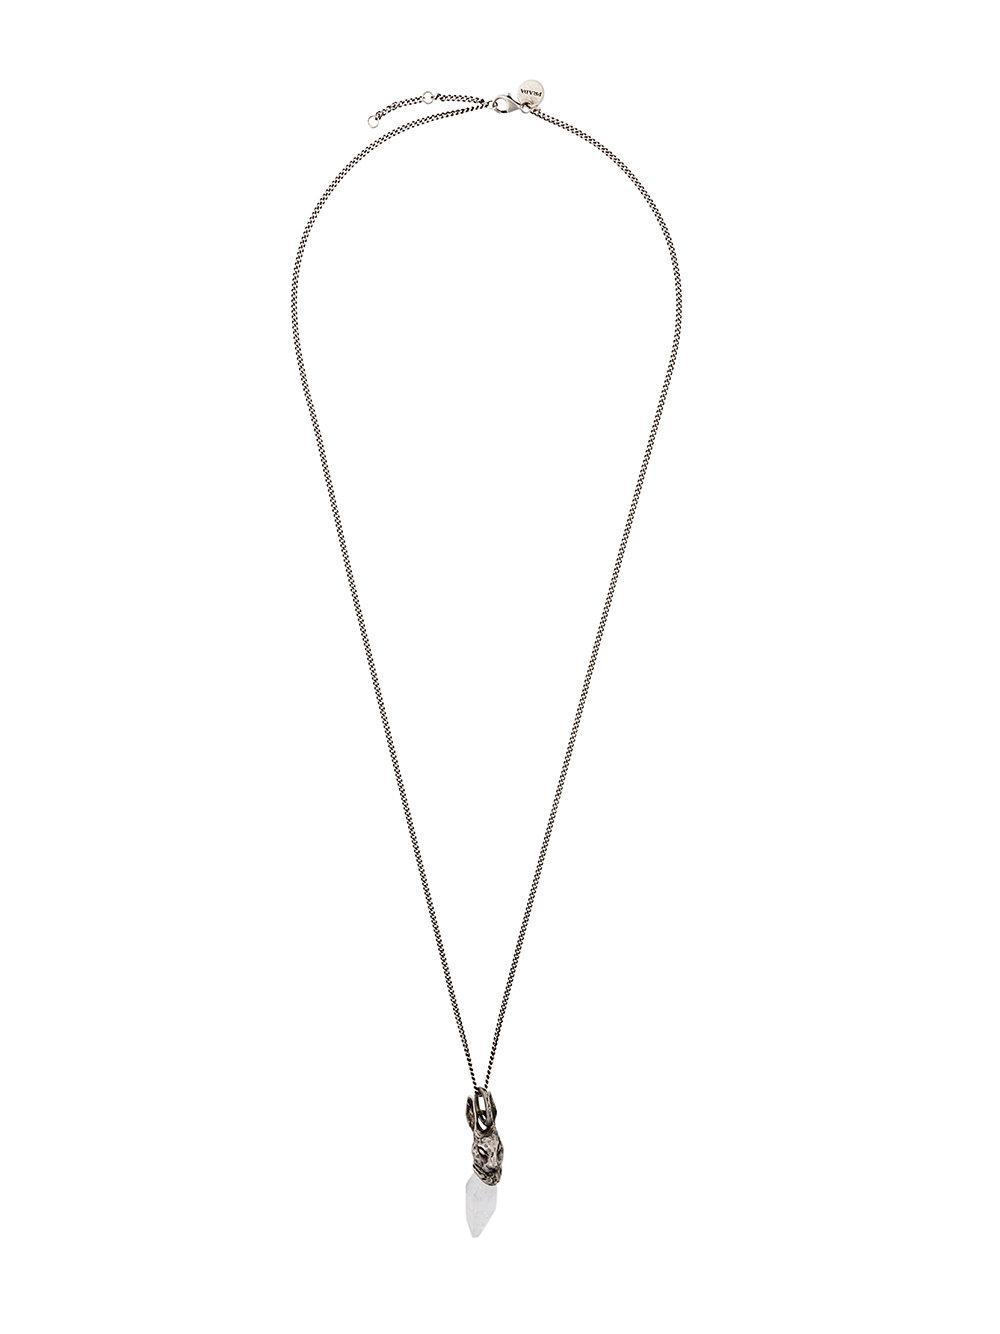 Prada Rabbit Pendant Necklace